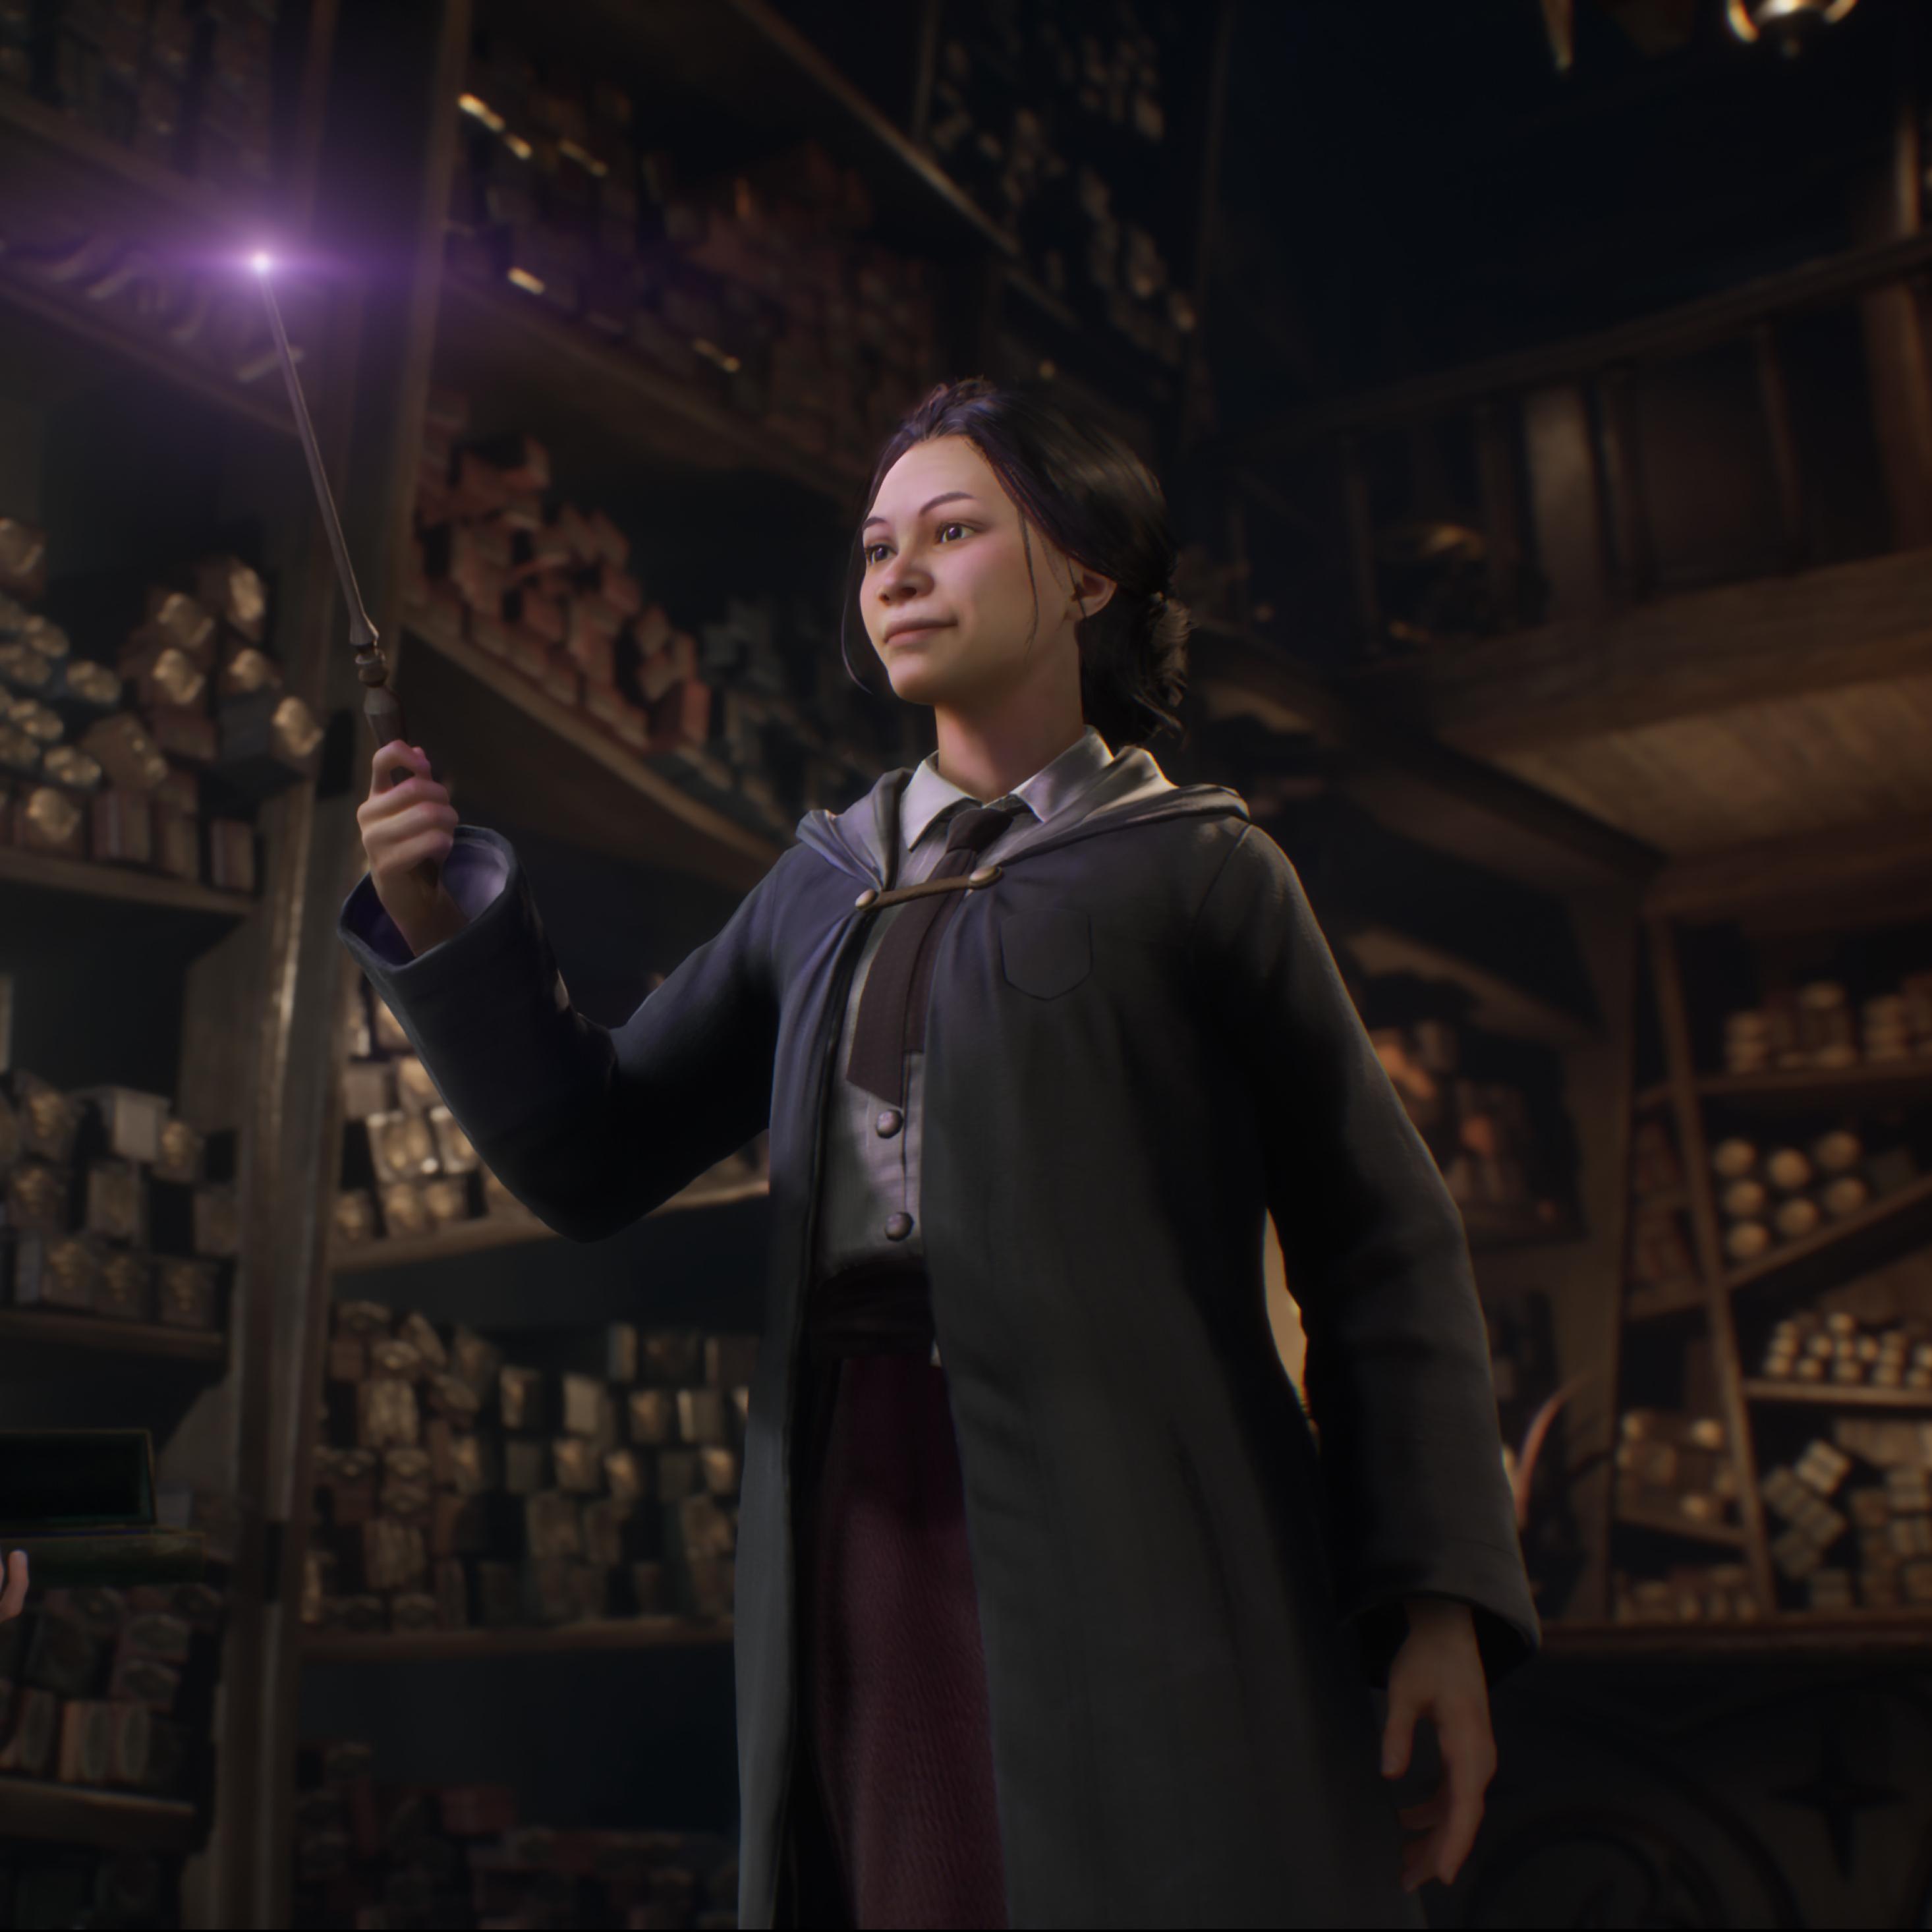 2932x2932 2021 Hogwarts Legacy Ipad Pro Retina Display ...